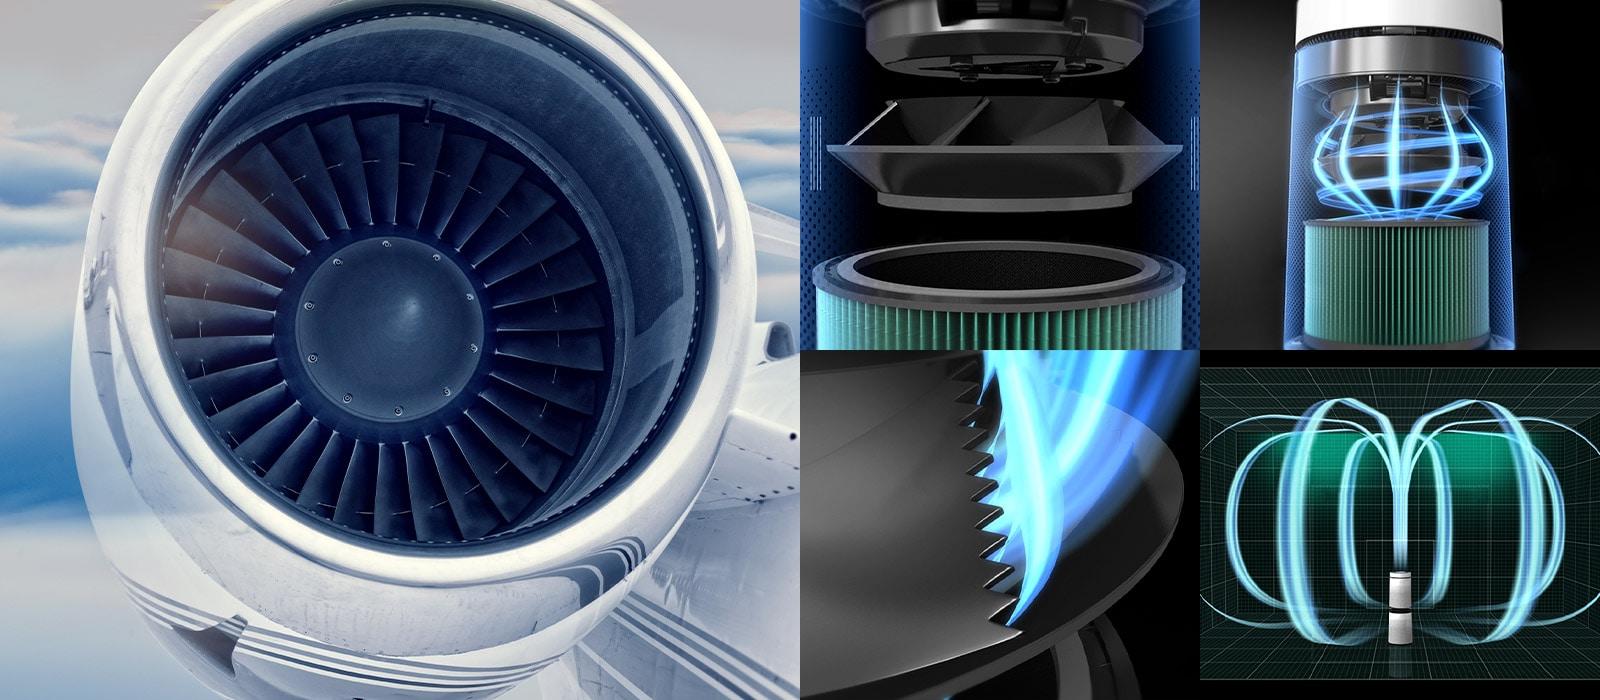 Brand-new aerospace-grade fan technology